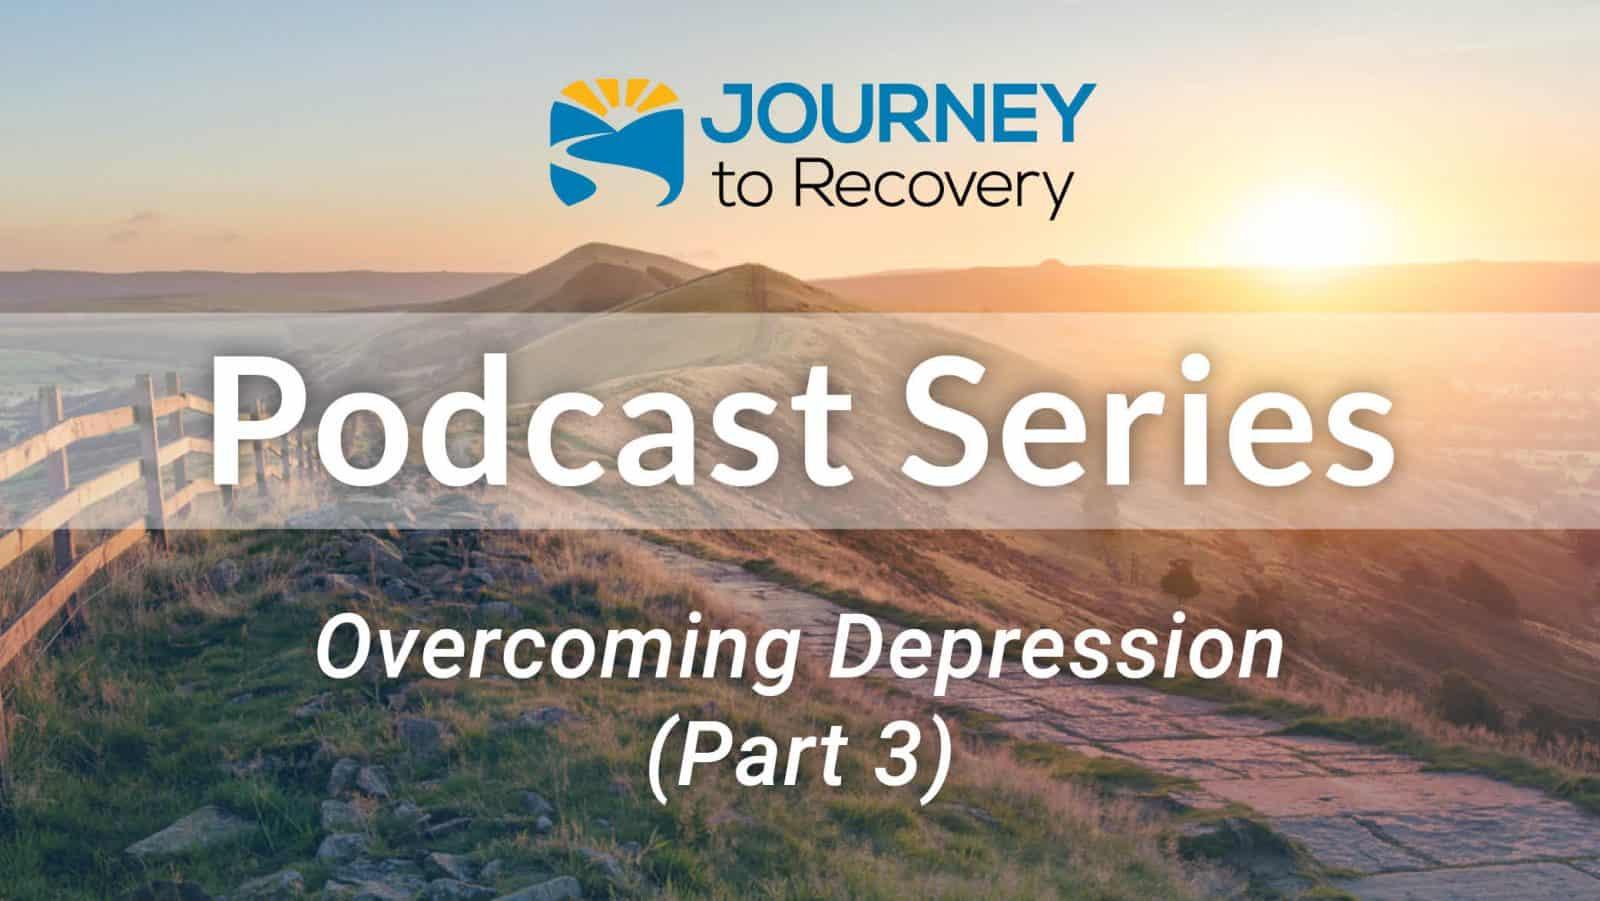 Overcoming Depression (Part 3)